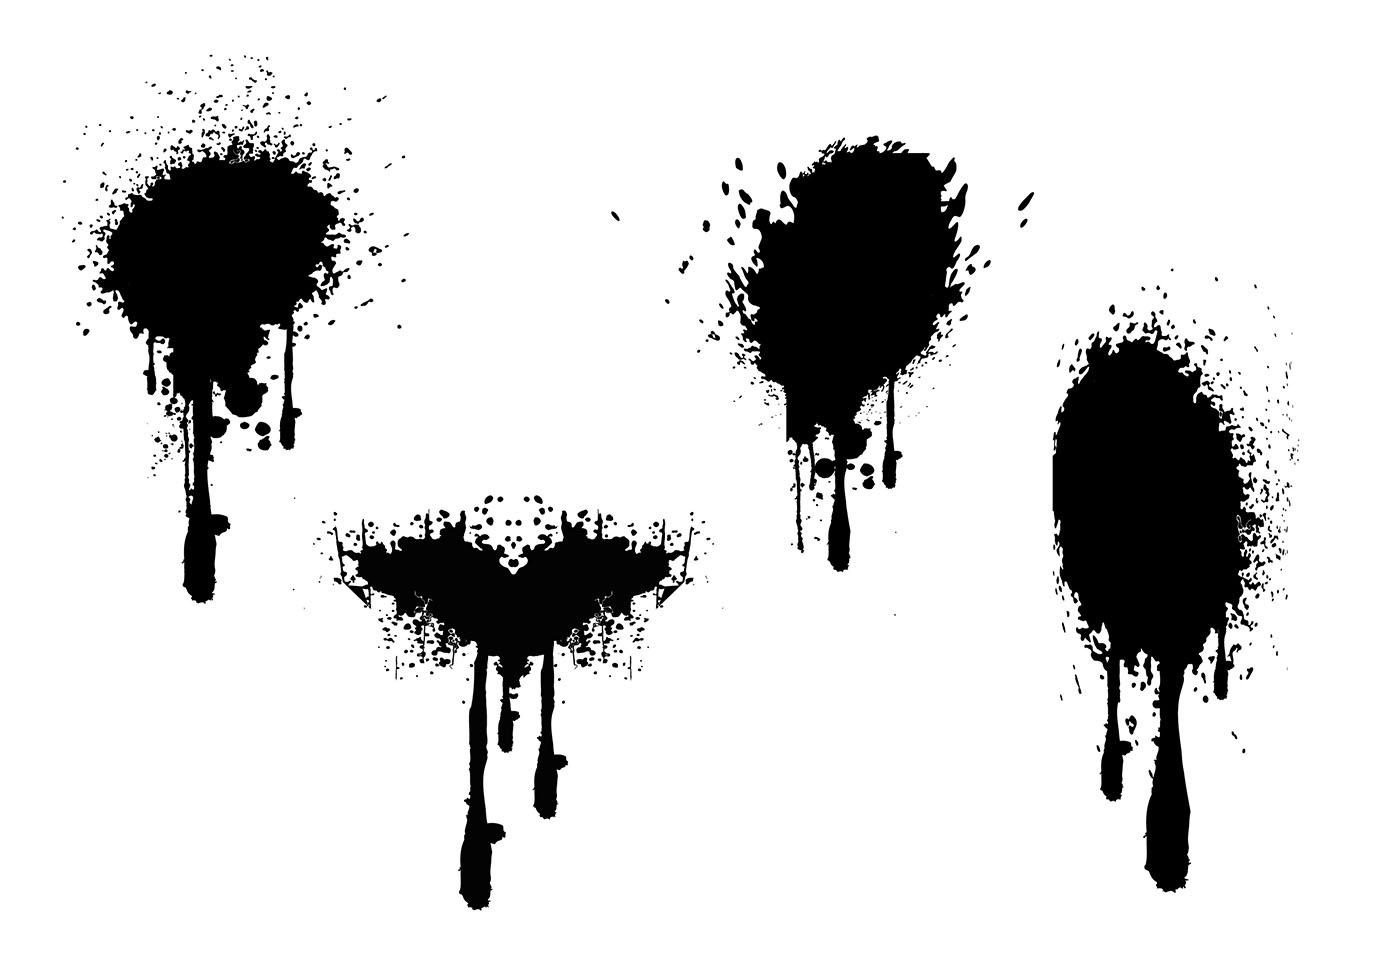 Spray Paint Drips Grunge Vectors